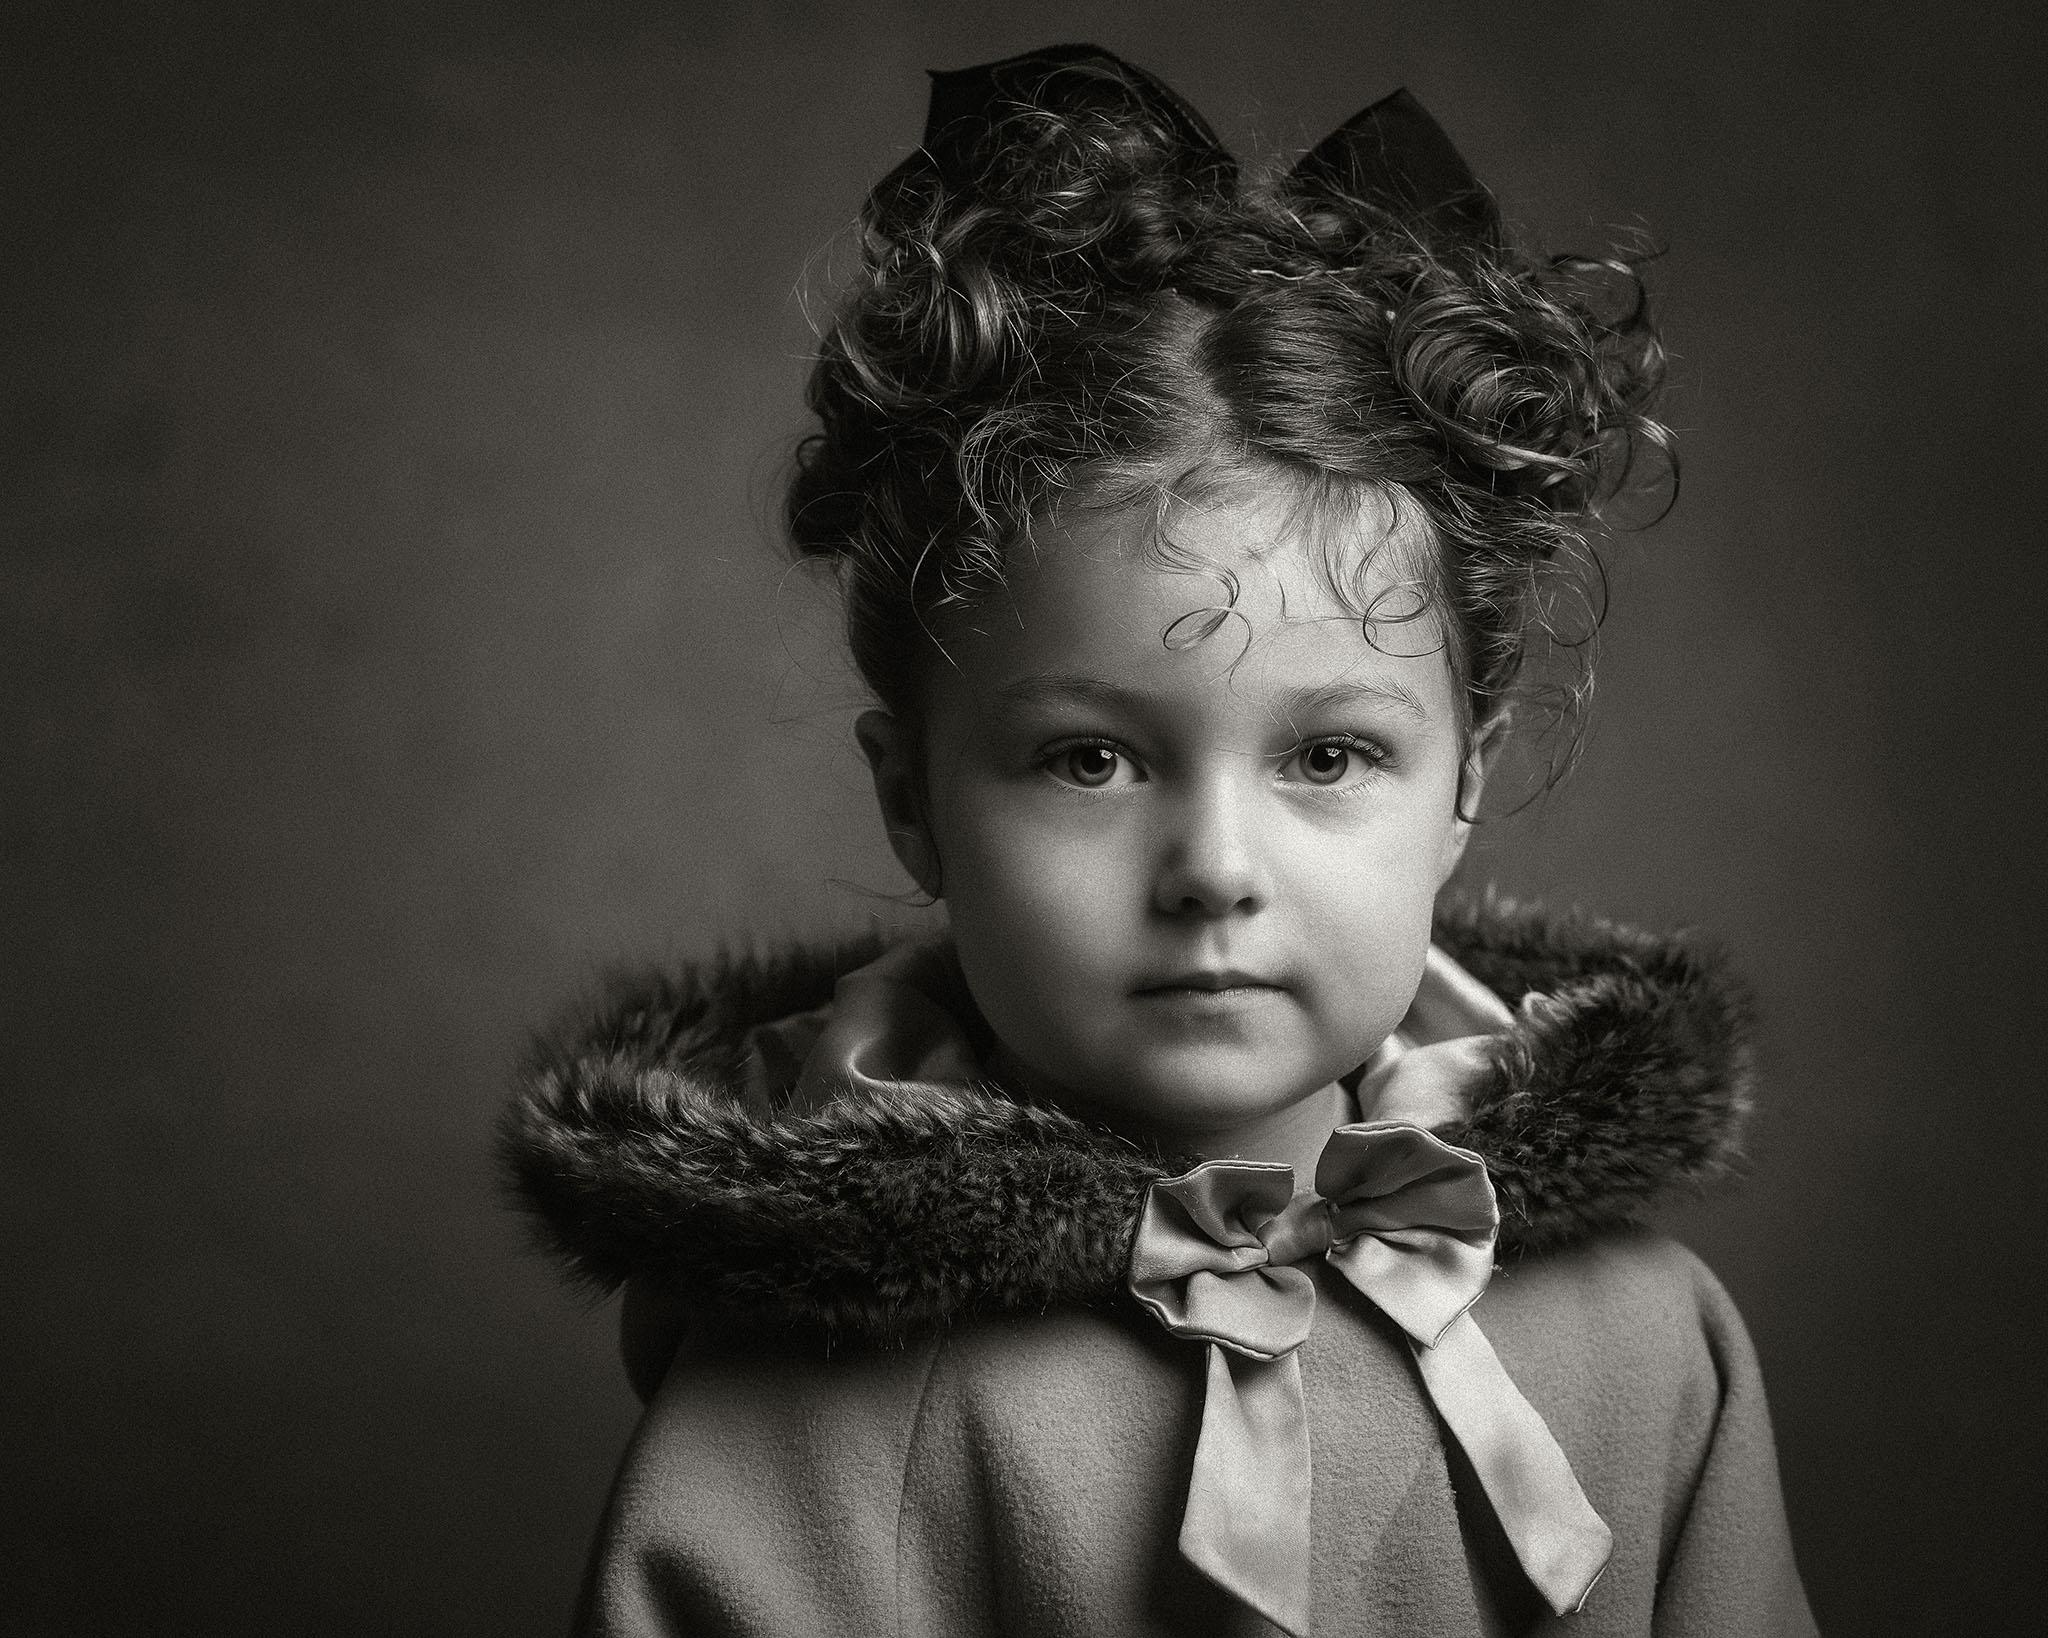 childrens photographer of the year Award winning photographer